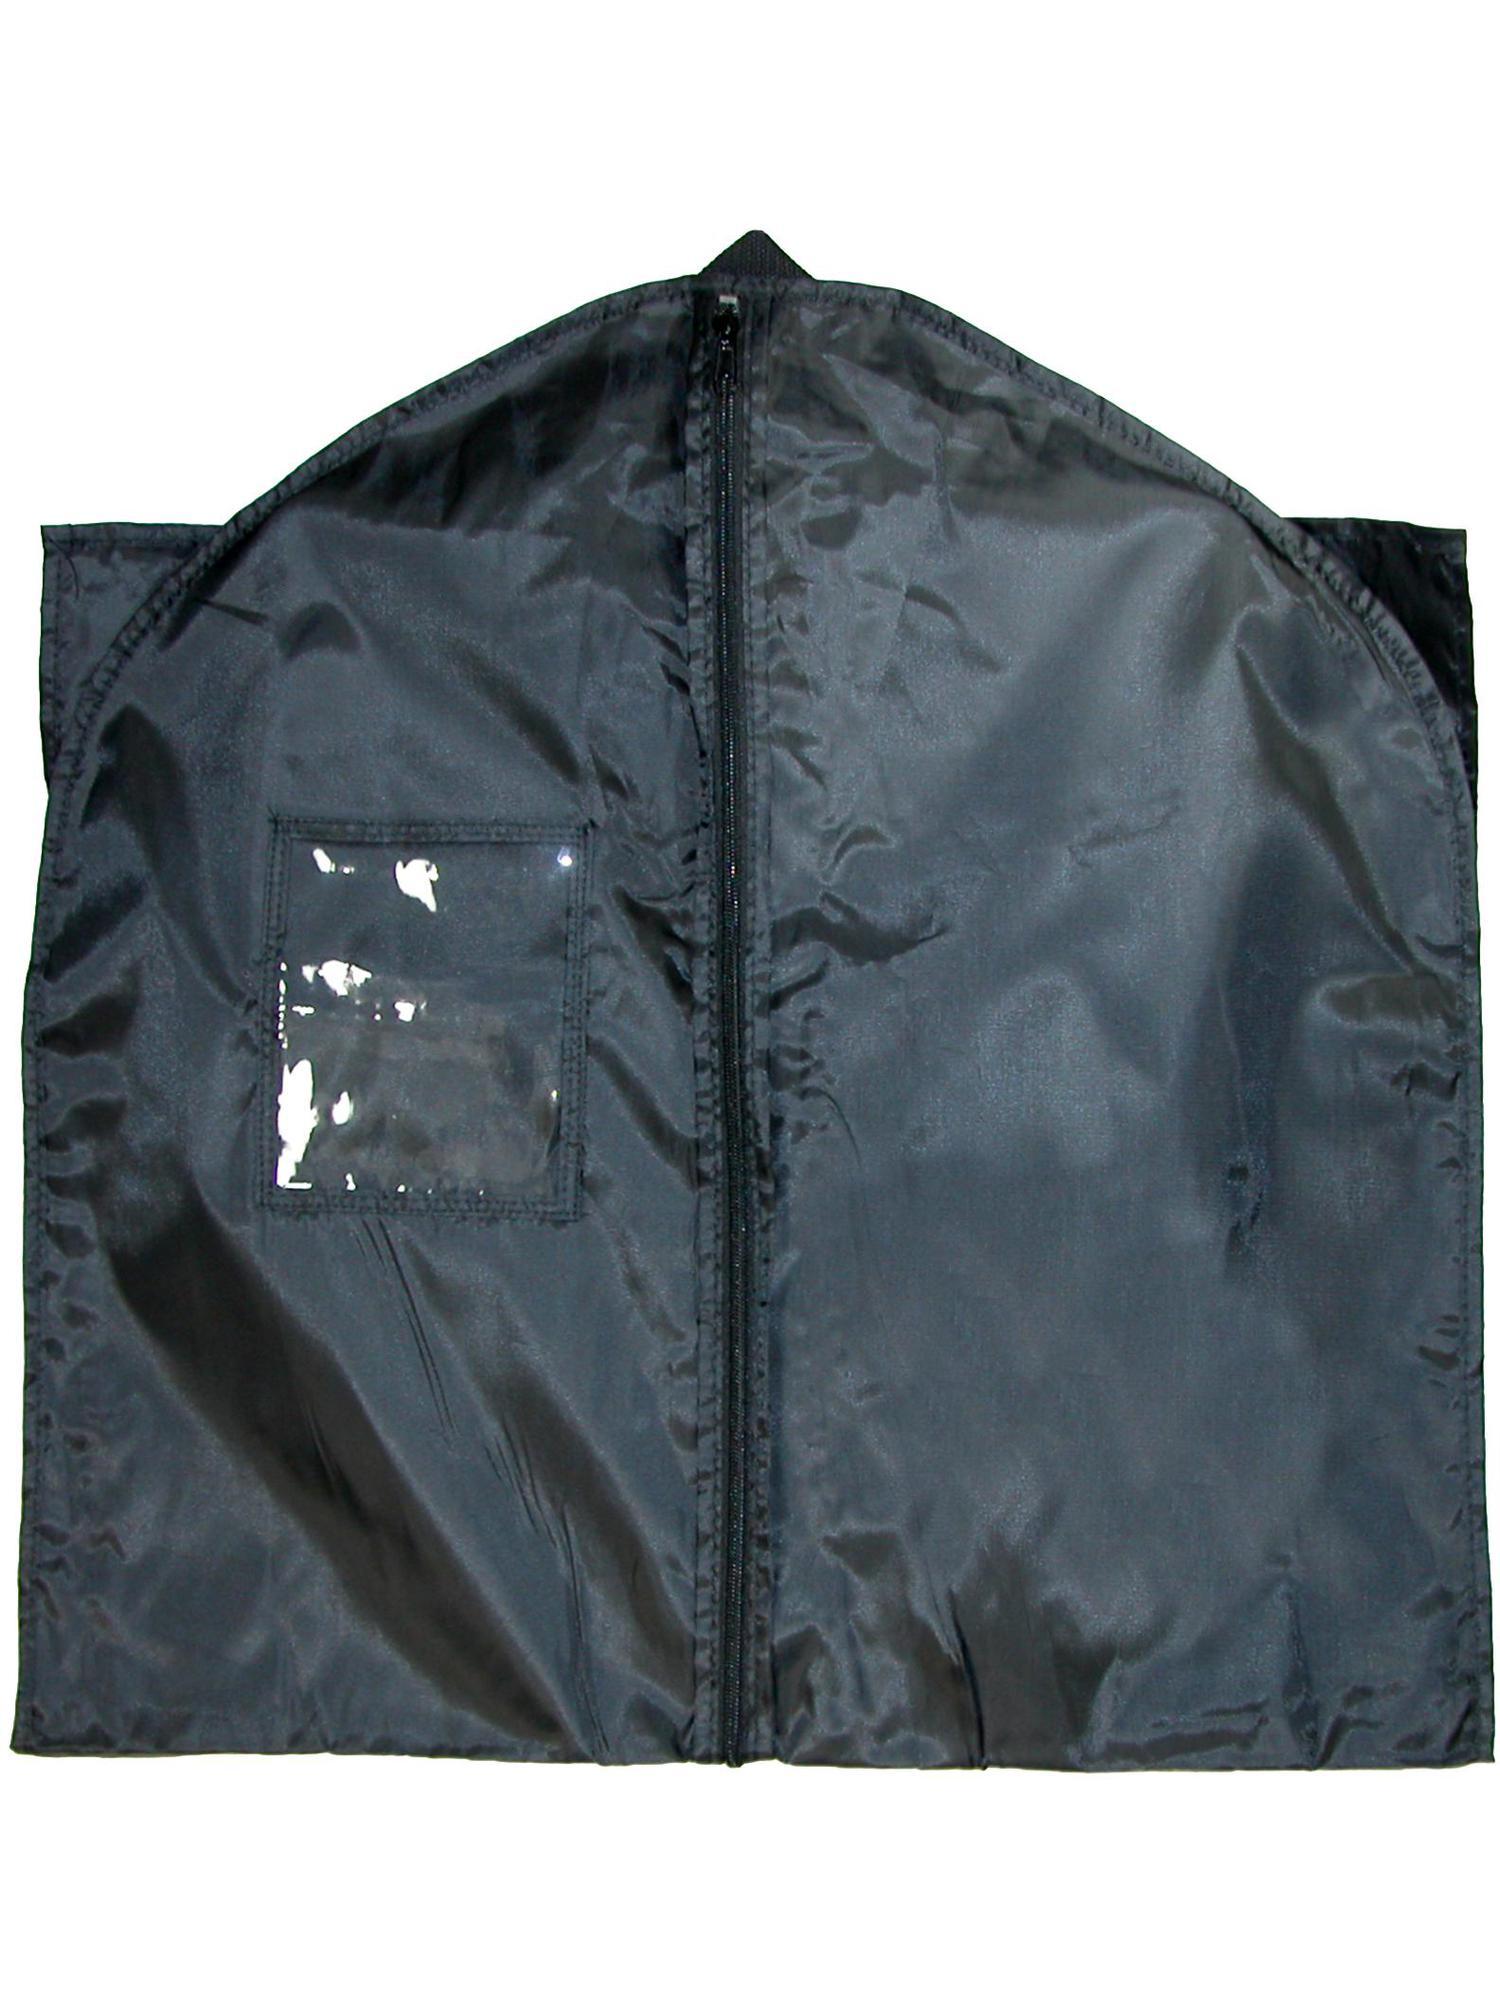 a25b4bbf0fdf Nylon Garment Bag with Double Handles